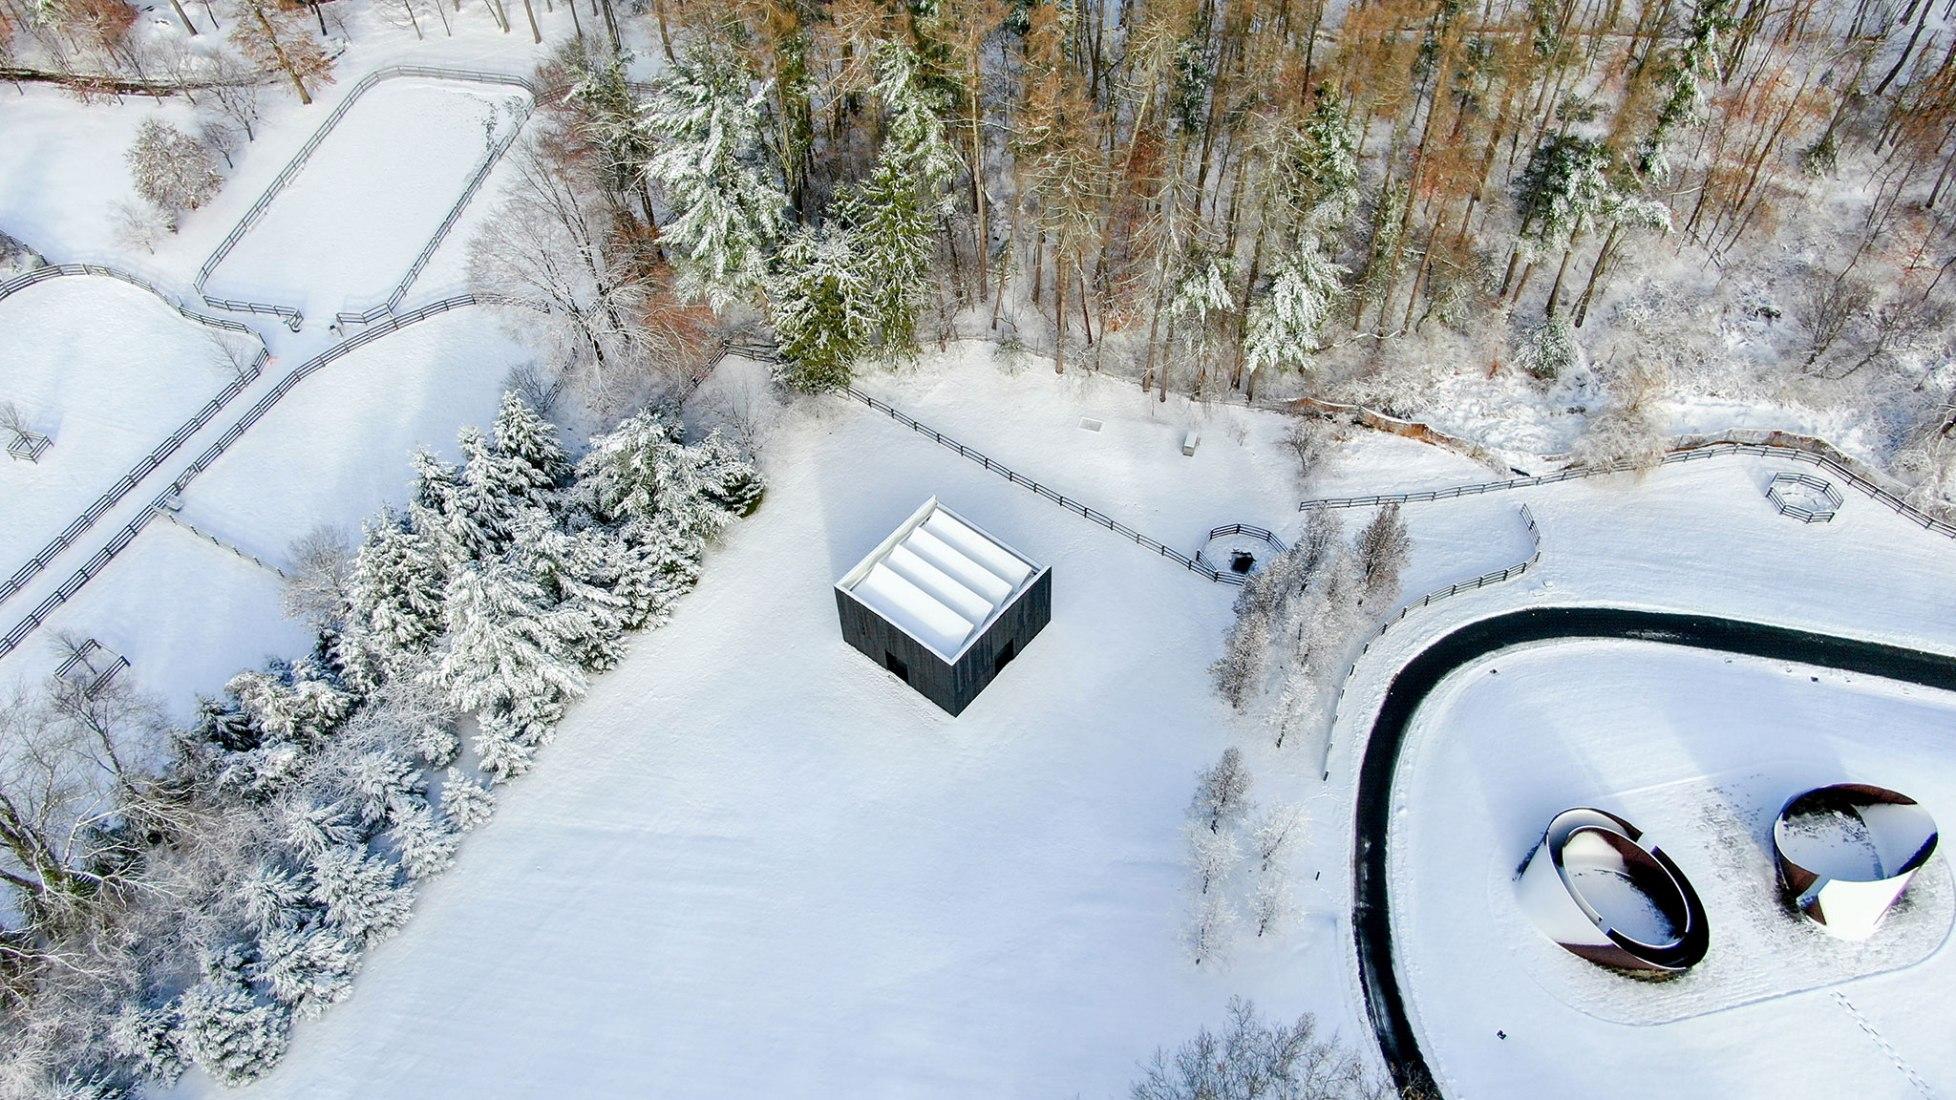 LX Pavilion by OLI Architecture. Photograph by FRAME Studios